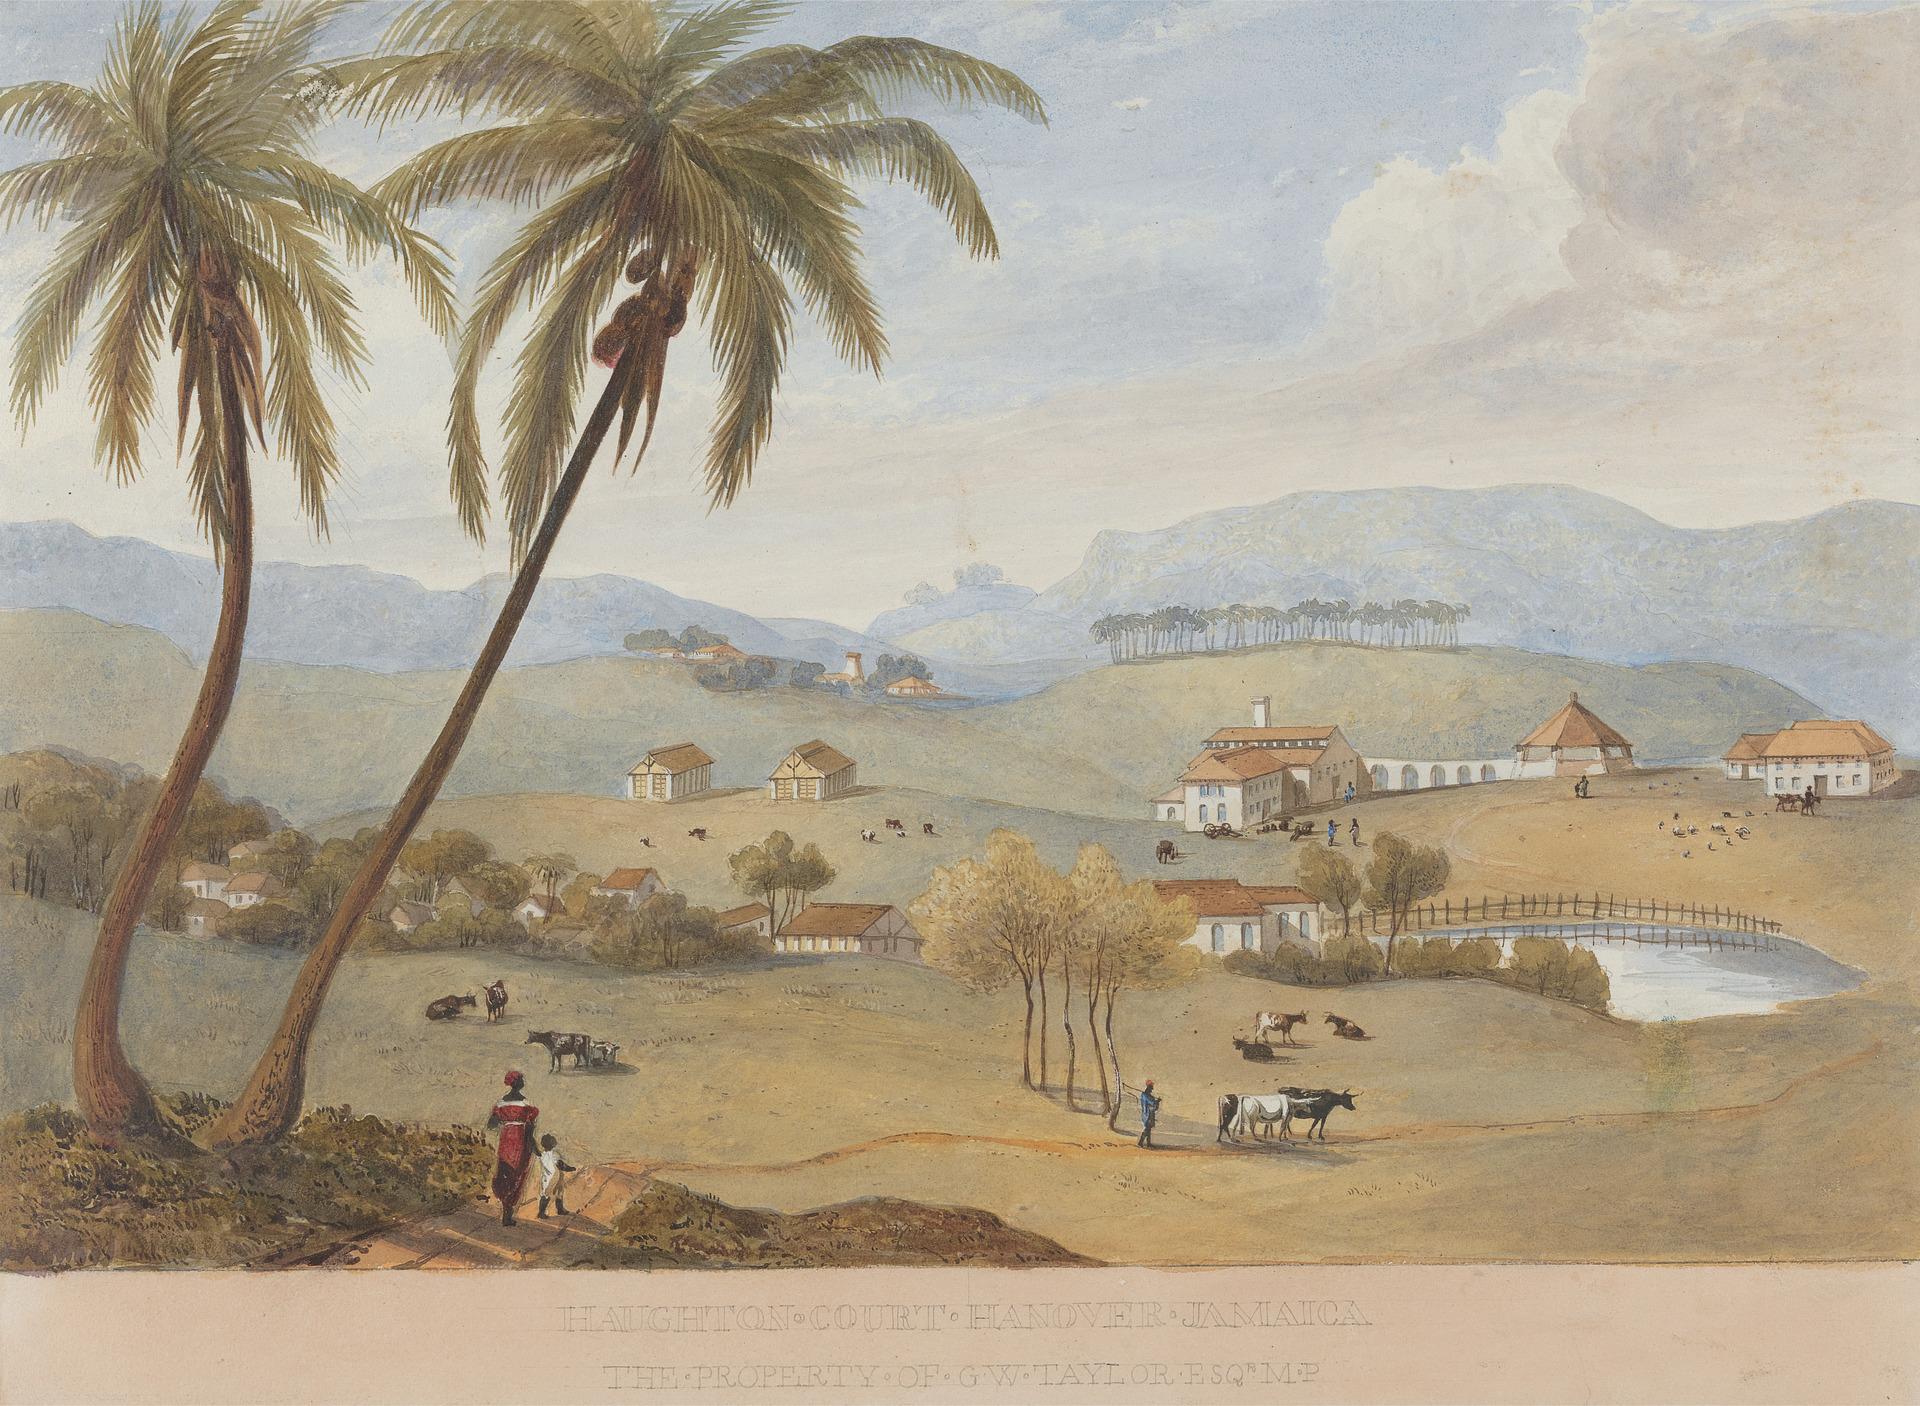 Haughton Court, Hanover, Jamaica